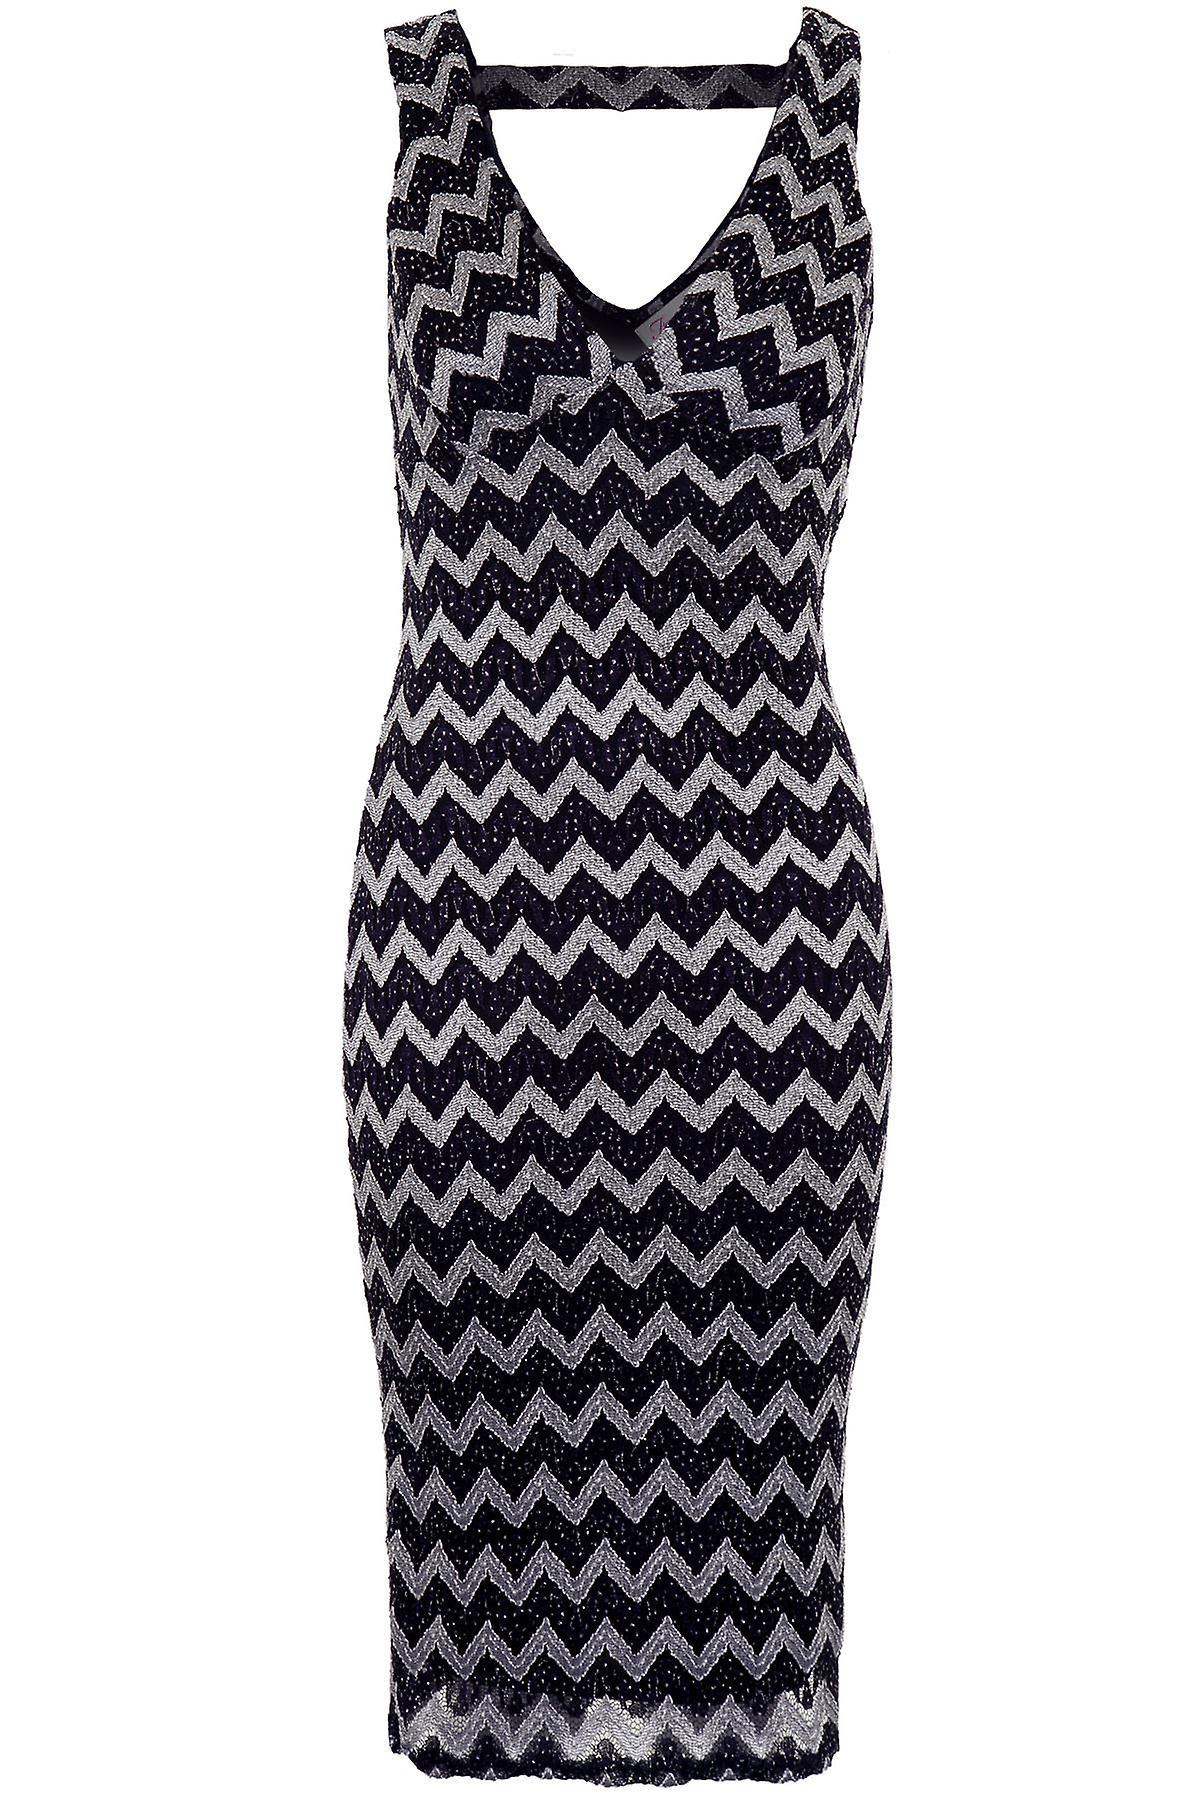 Ladies V Neck Back Lined Glittery Zig Zag Women's Bodycon Knee Midi Dress